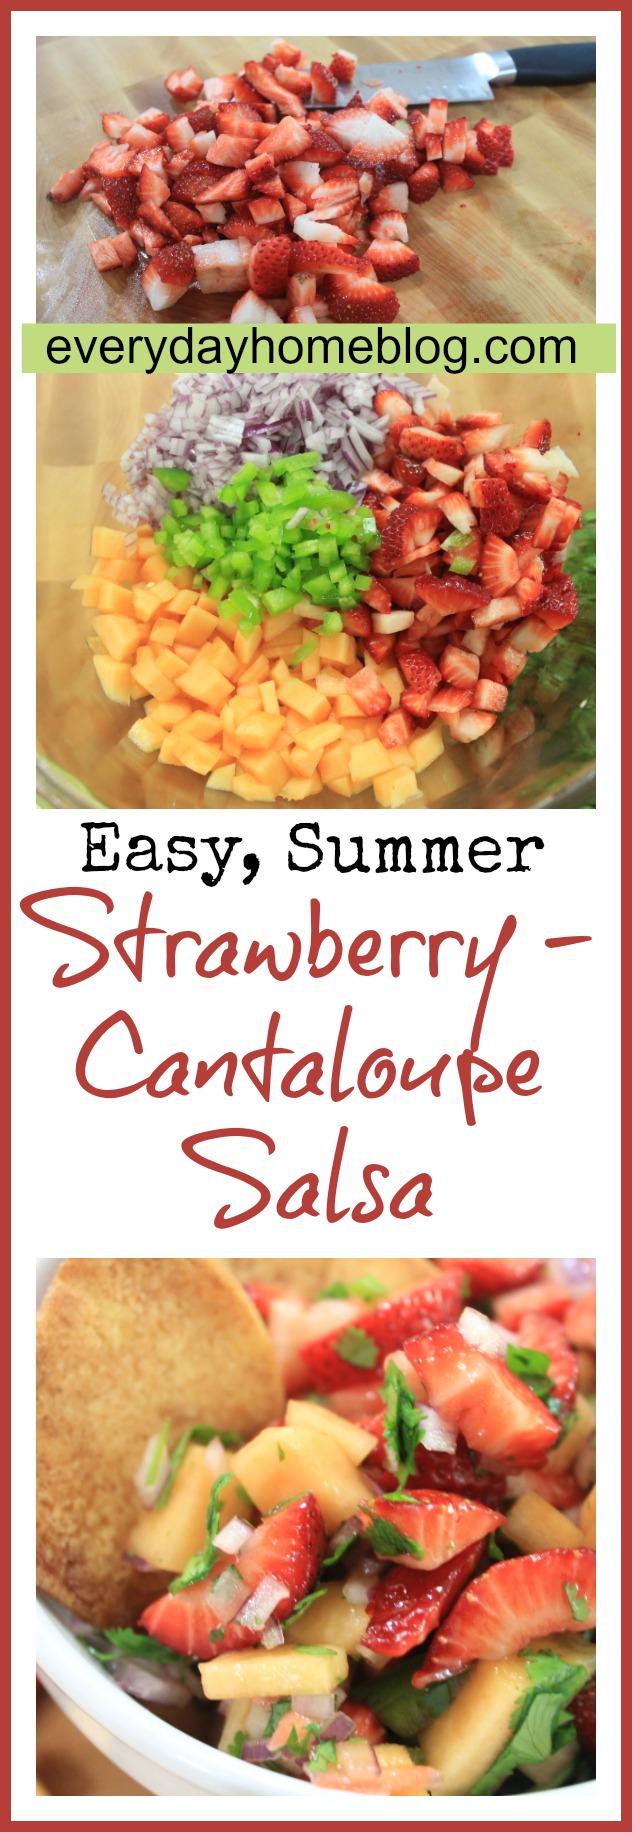 Strawberry-Cantaloupe Summer Salsa by The Everyday Home / www.evevrydayhomeblog.com